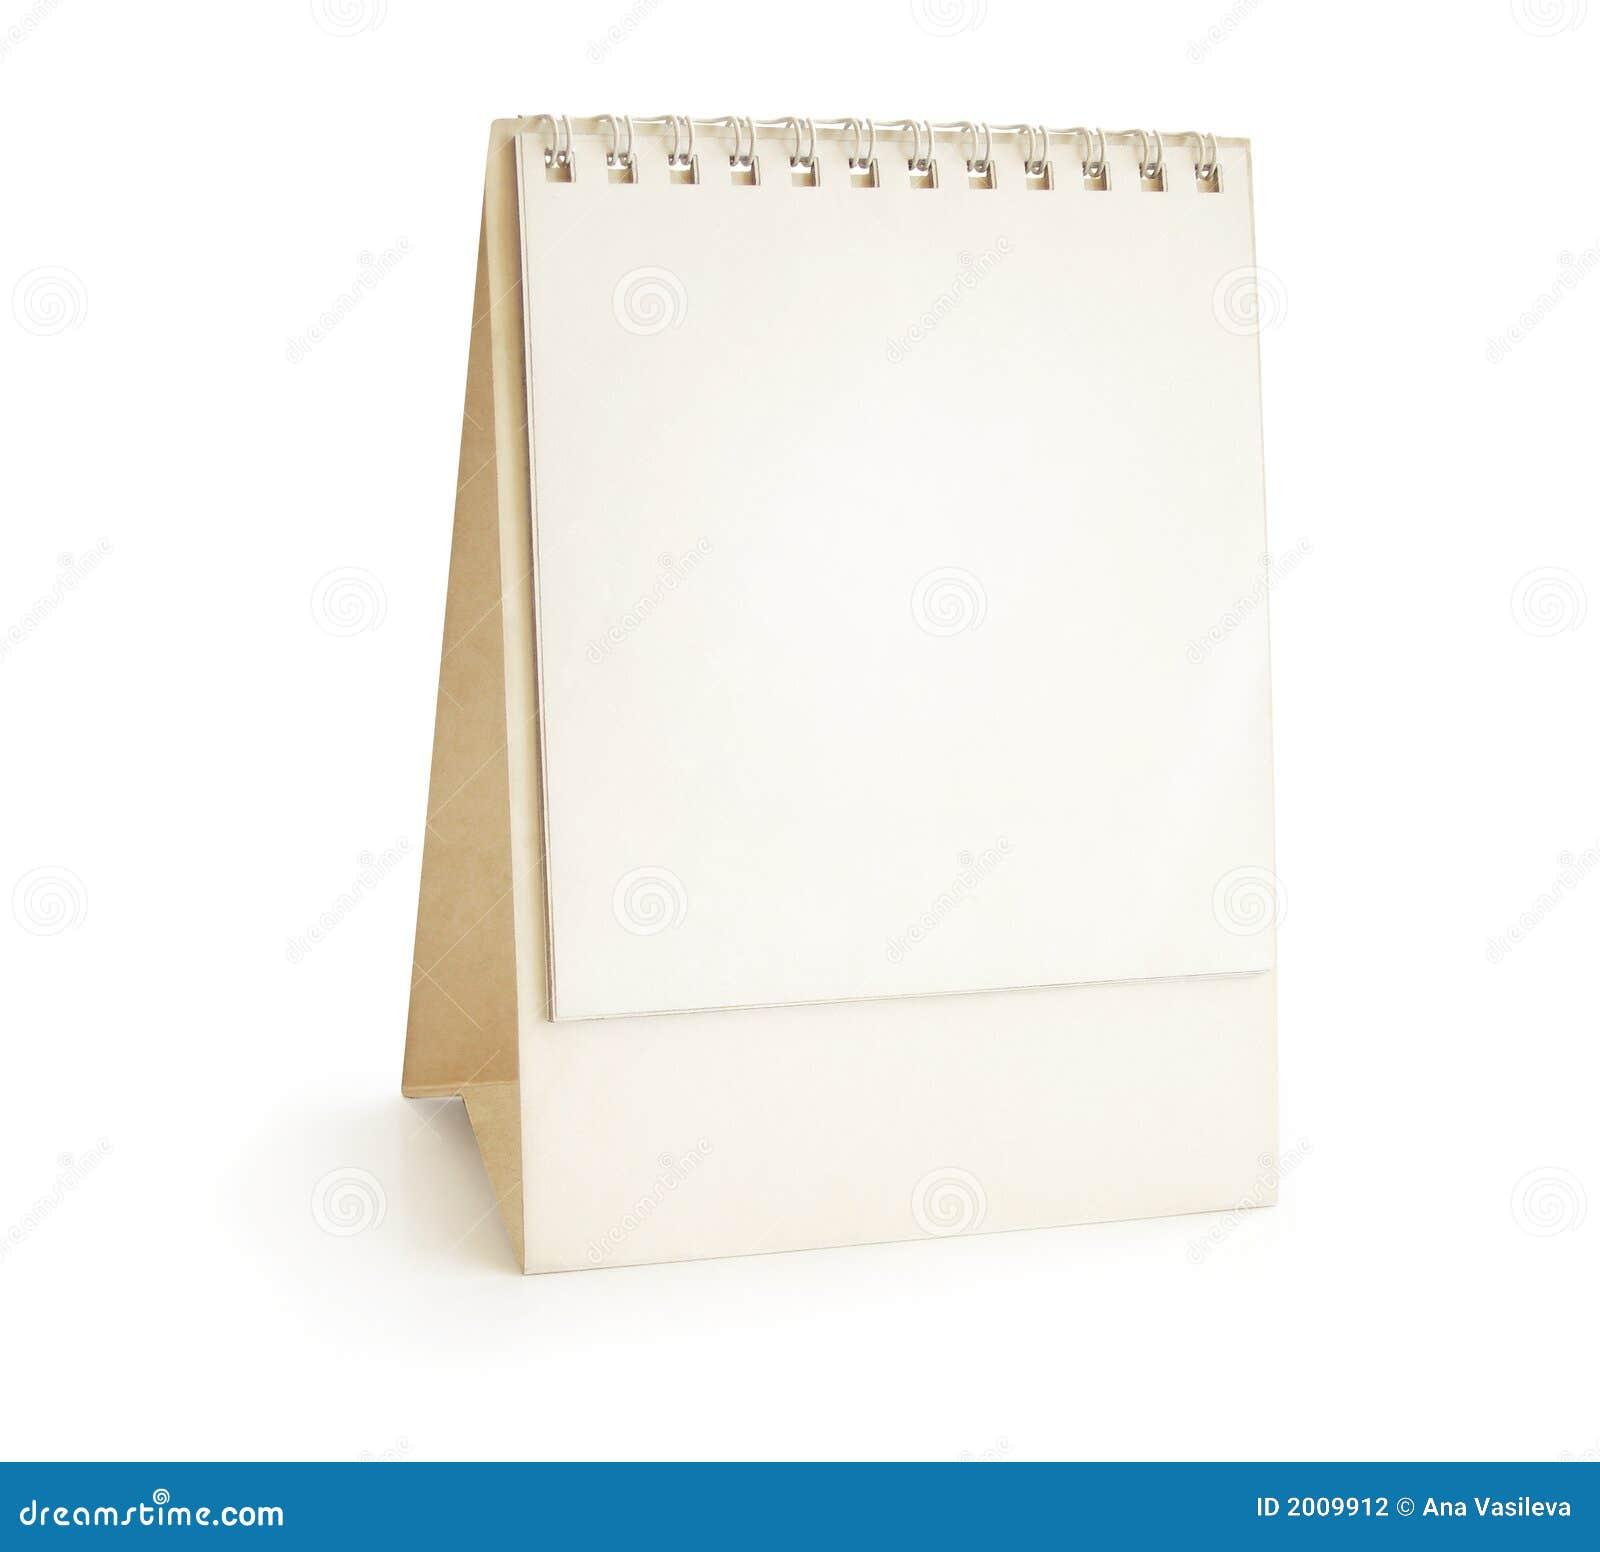 Calendario da tavolino - piramide